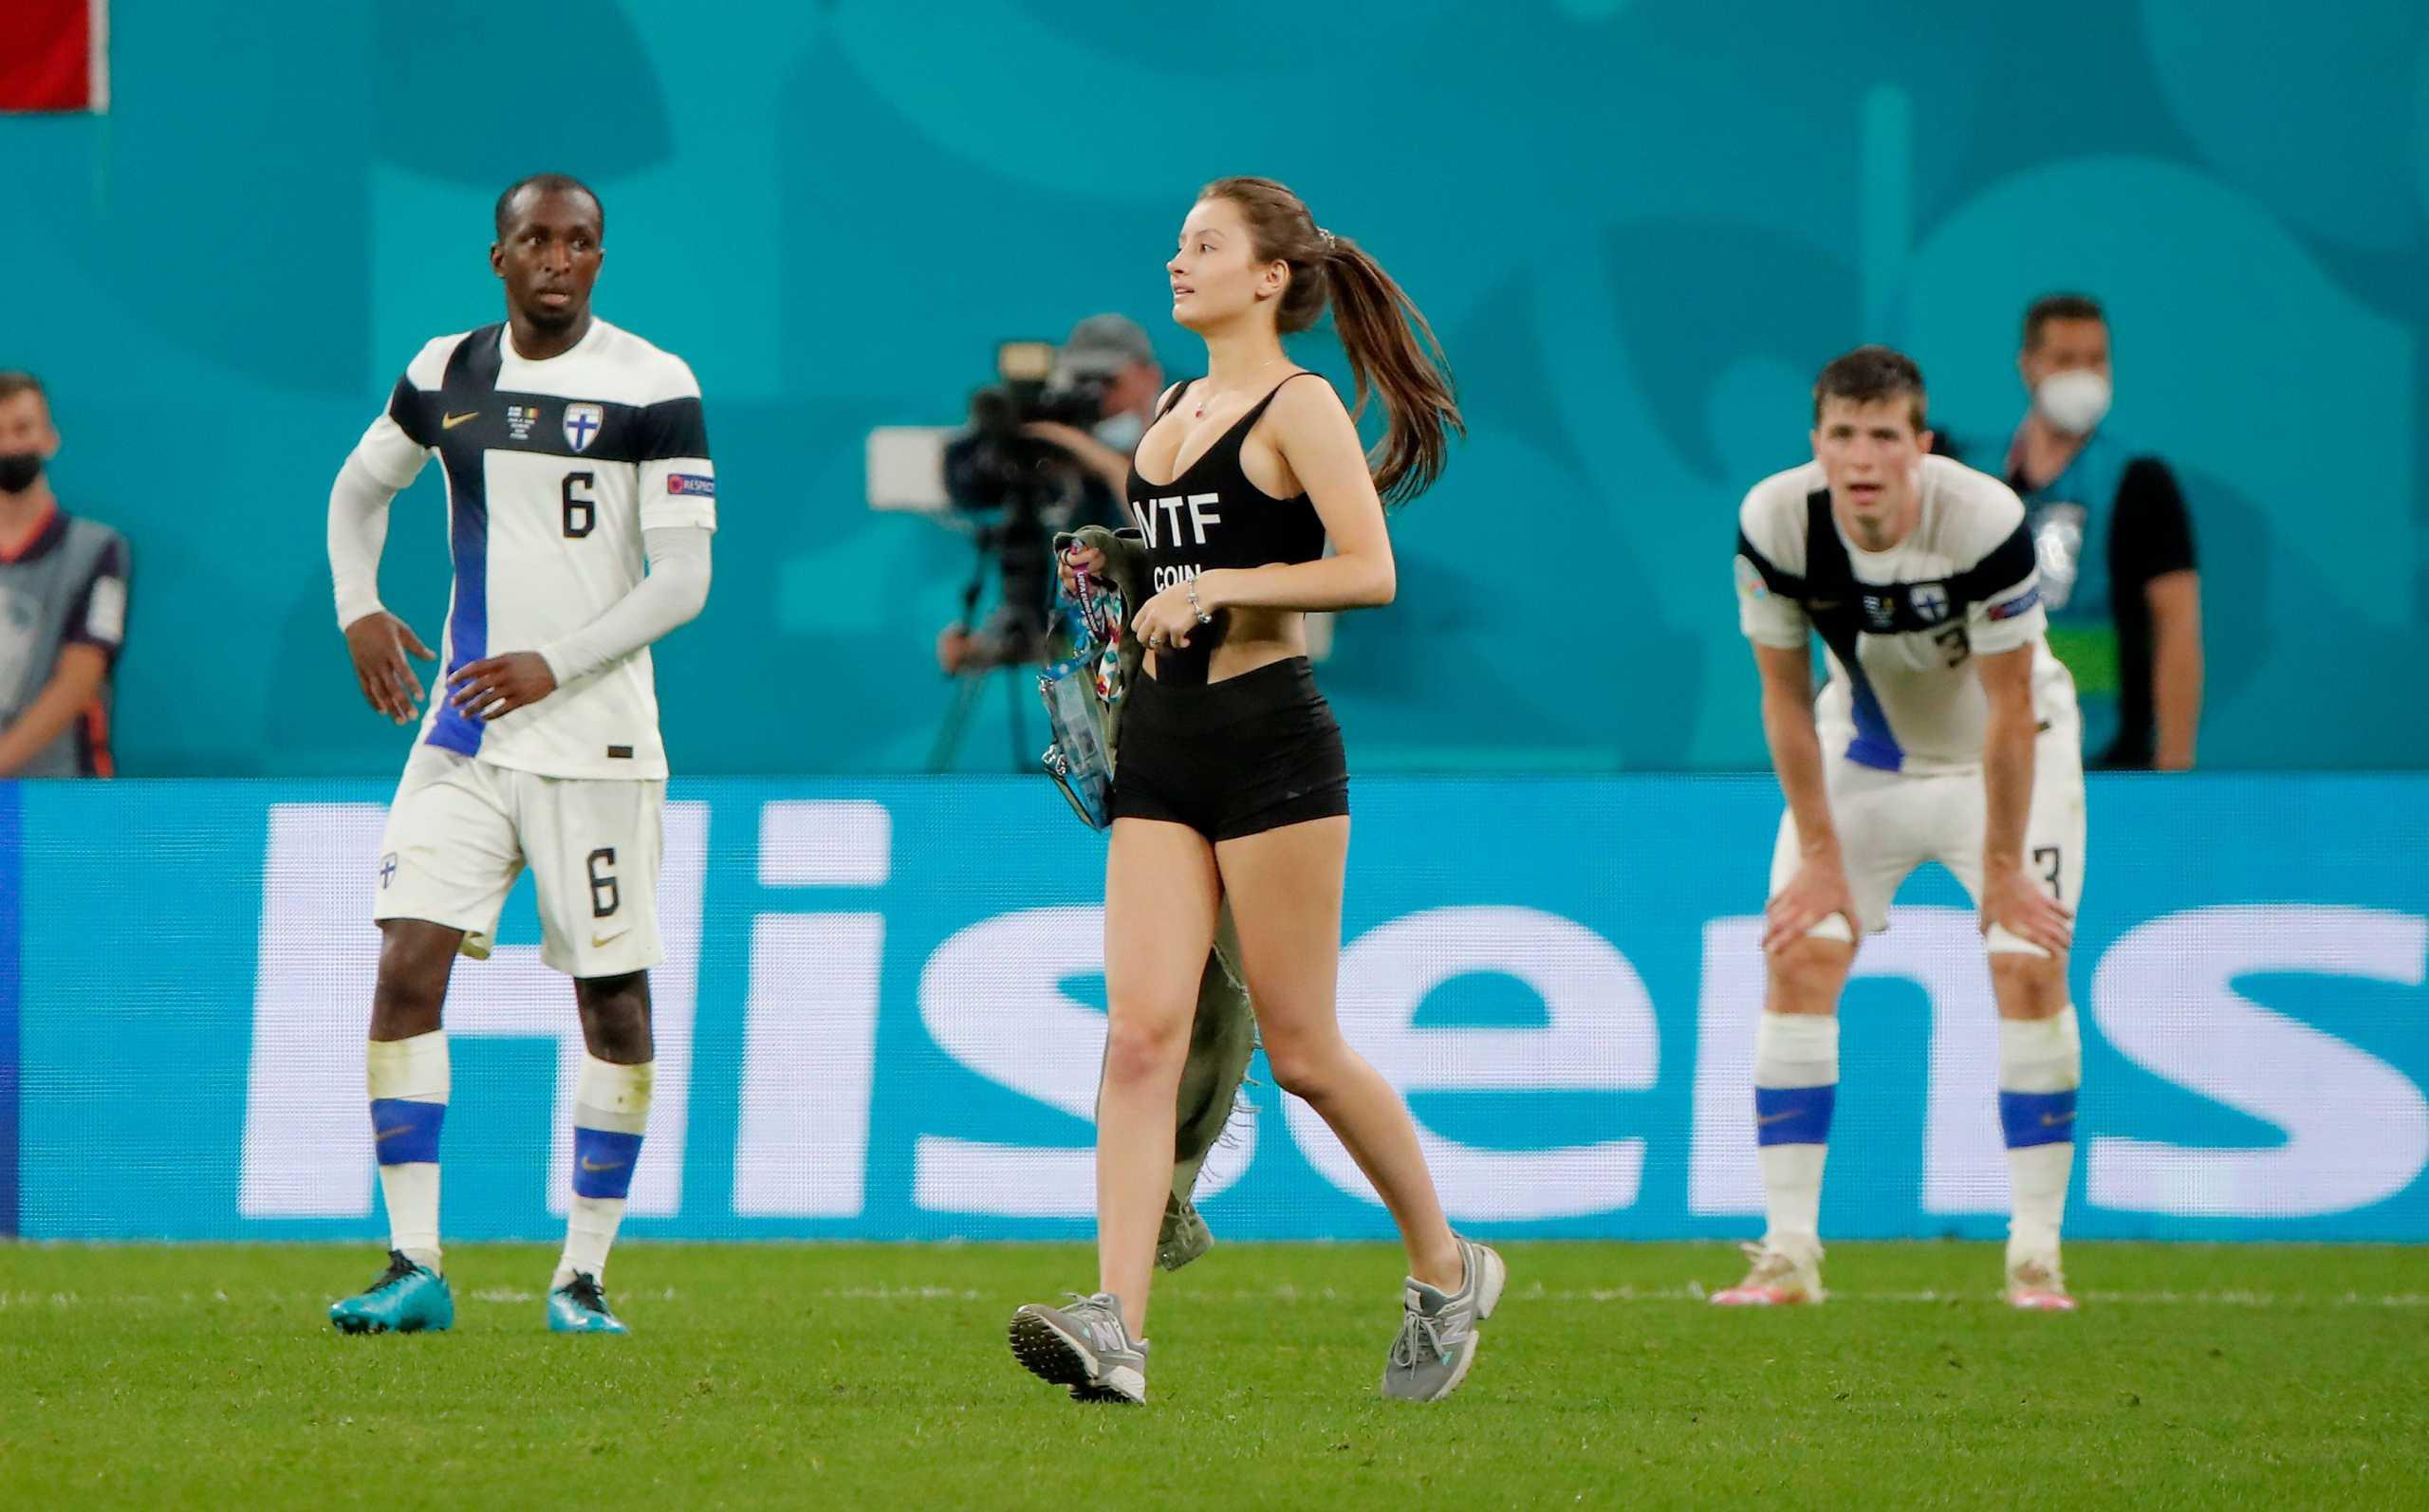 Euro 2020: Γυναίκα διέκοψε προσωρινά το Φινλανδία – Βέλγιο εισβάλλοντας στο γήπεδο